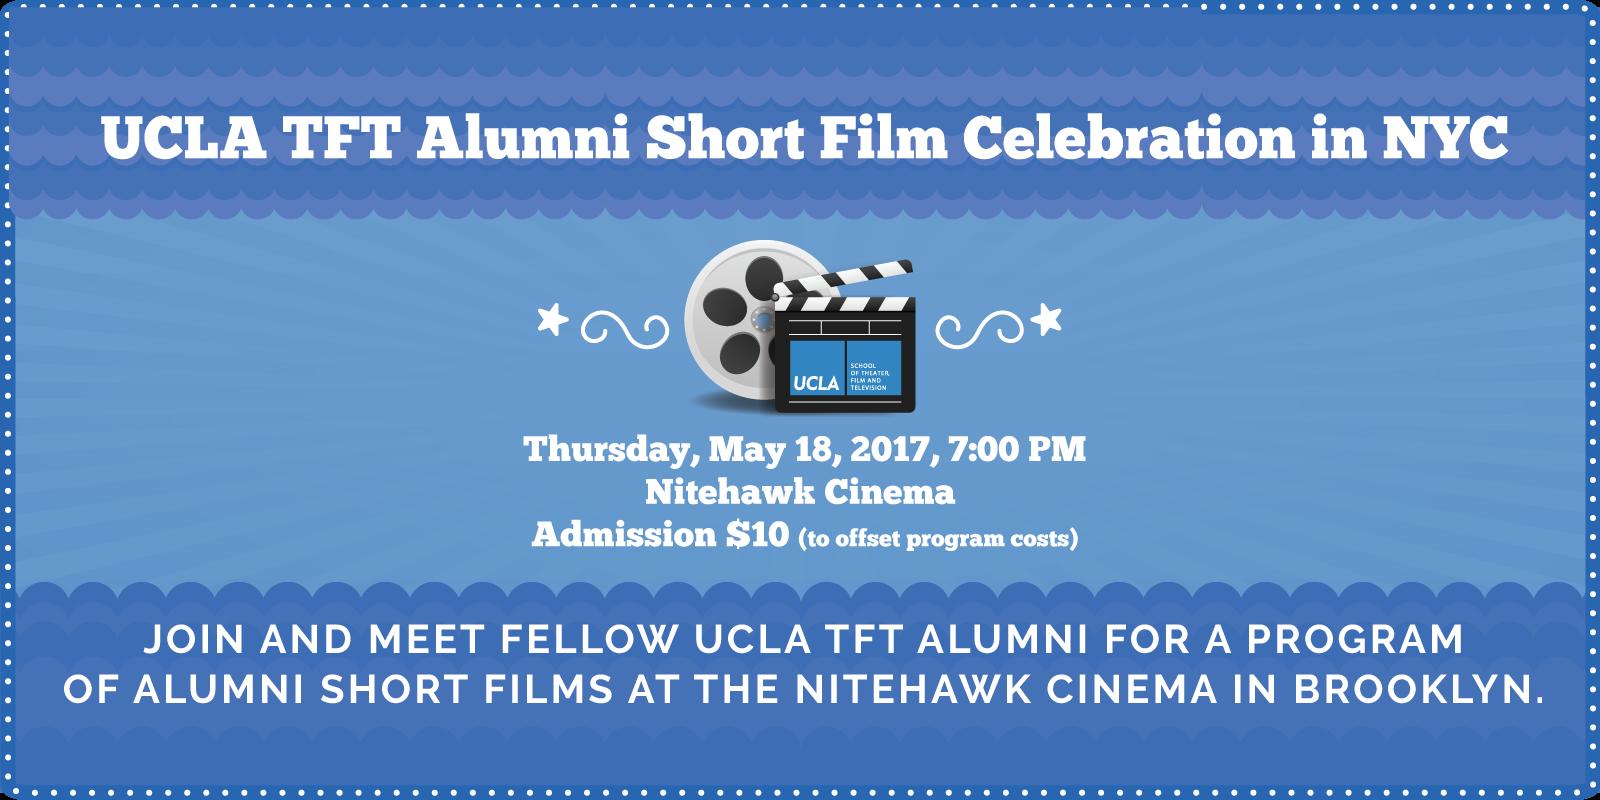 UCLA TFT Alumni Short Film Celebration in NYC